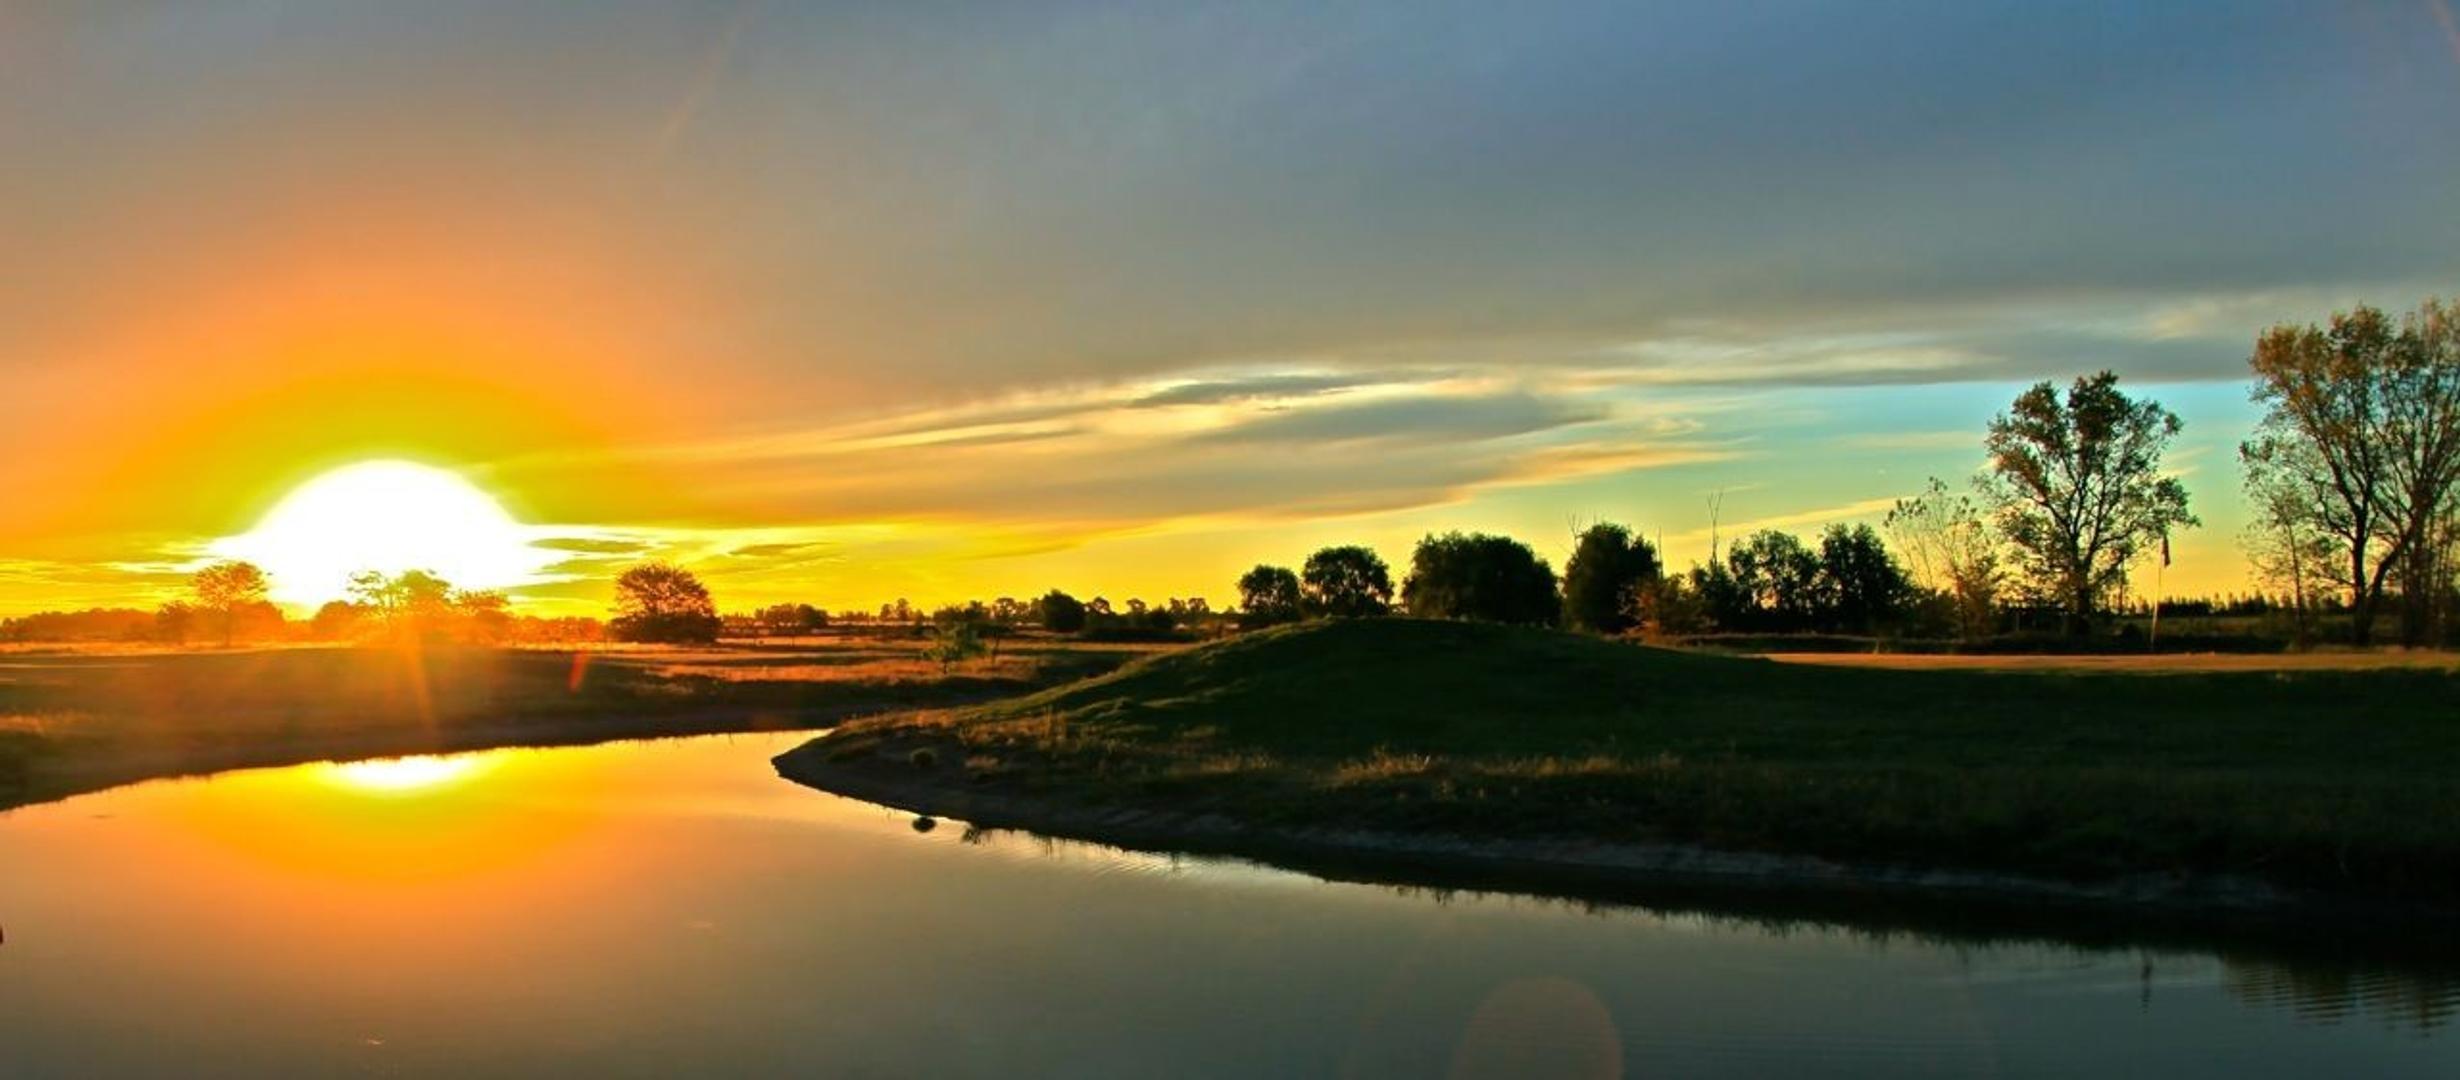 Tizado Pilar vende lotes al golf en Medal CC, Pilar y Alrededores - PIL3849_LP172612_1